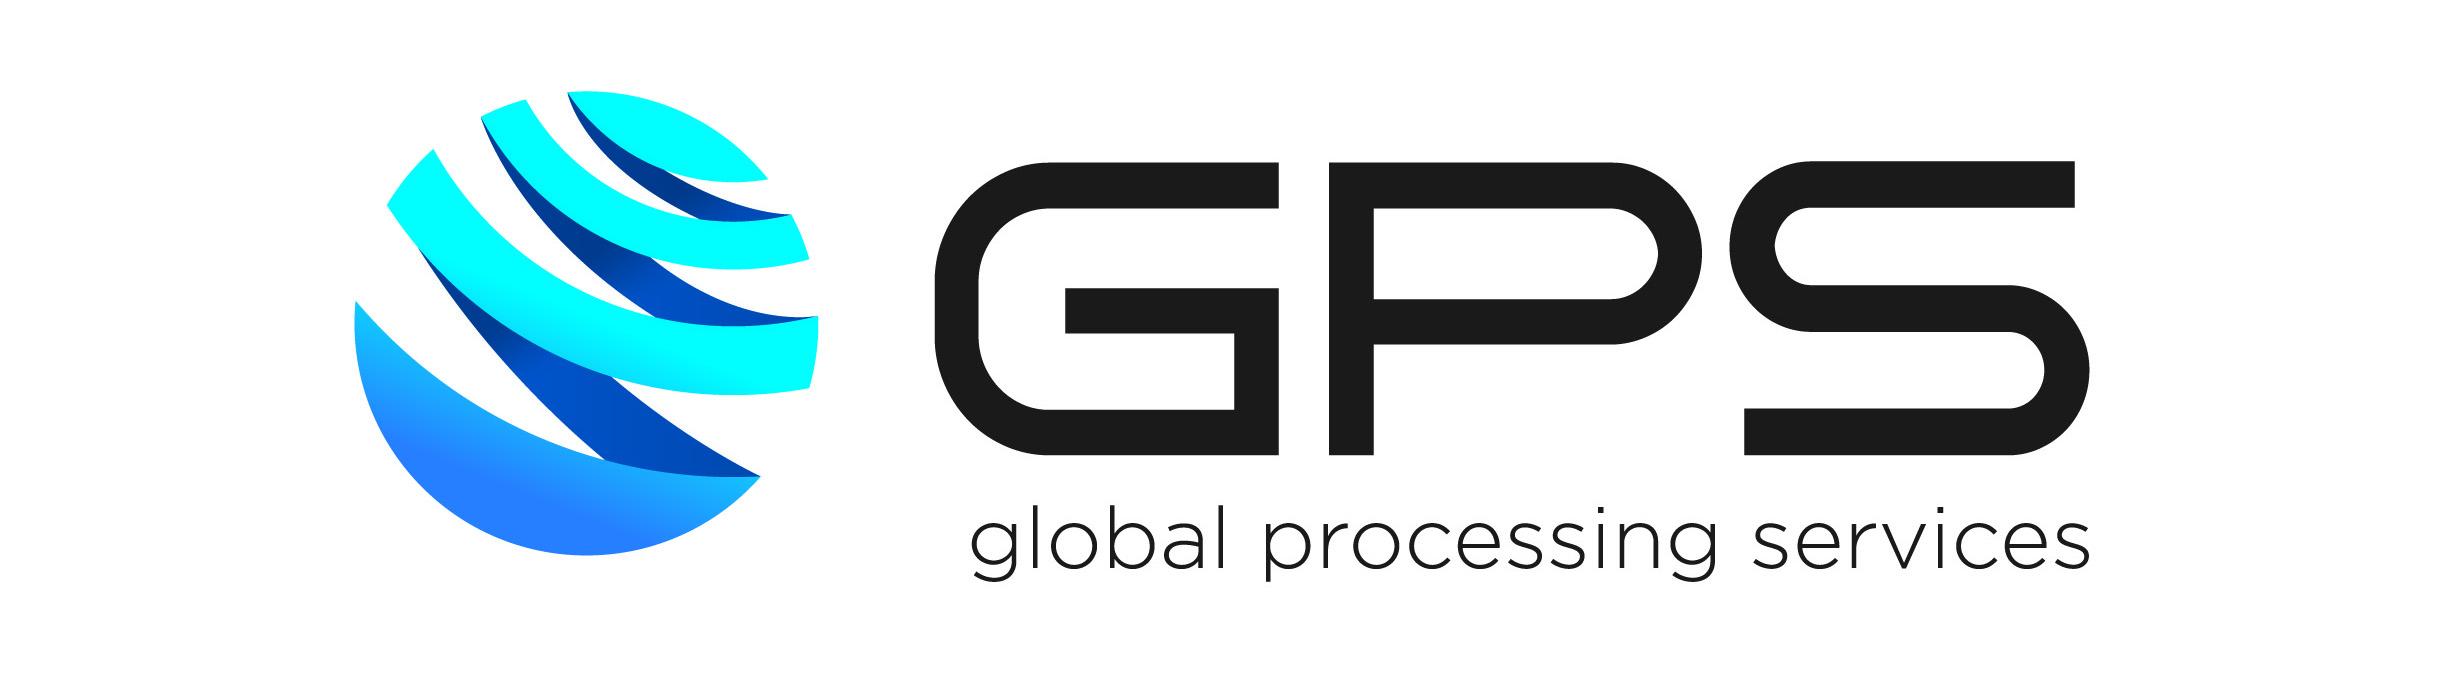 GPS to Join Mastercard's Fintech Express Programme